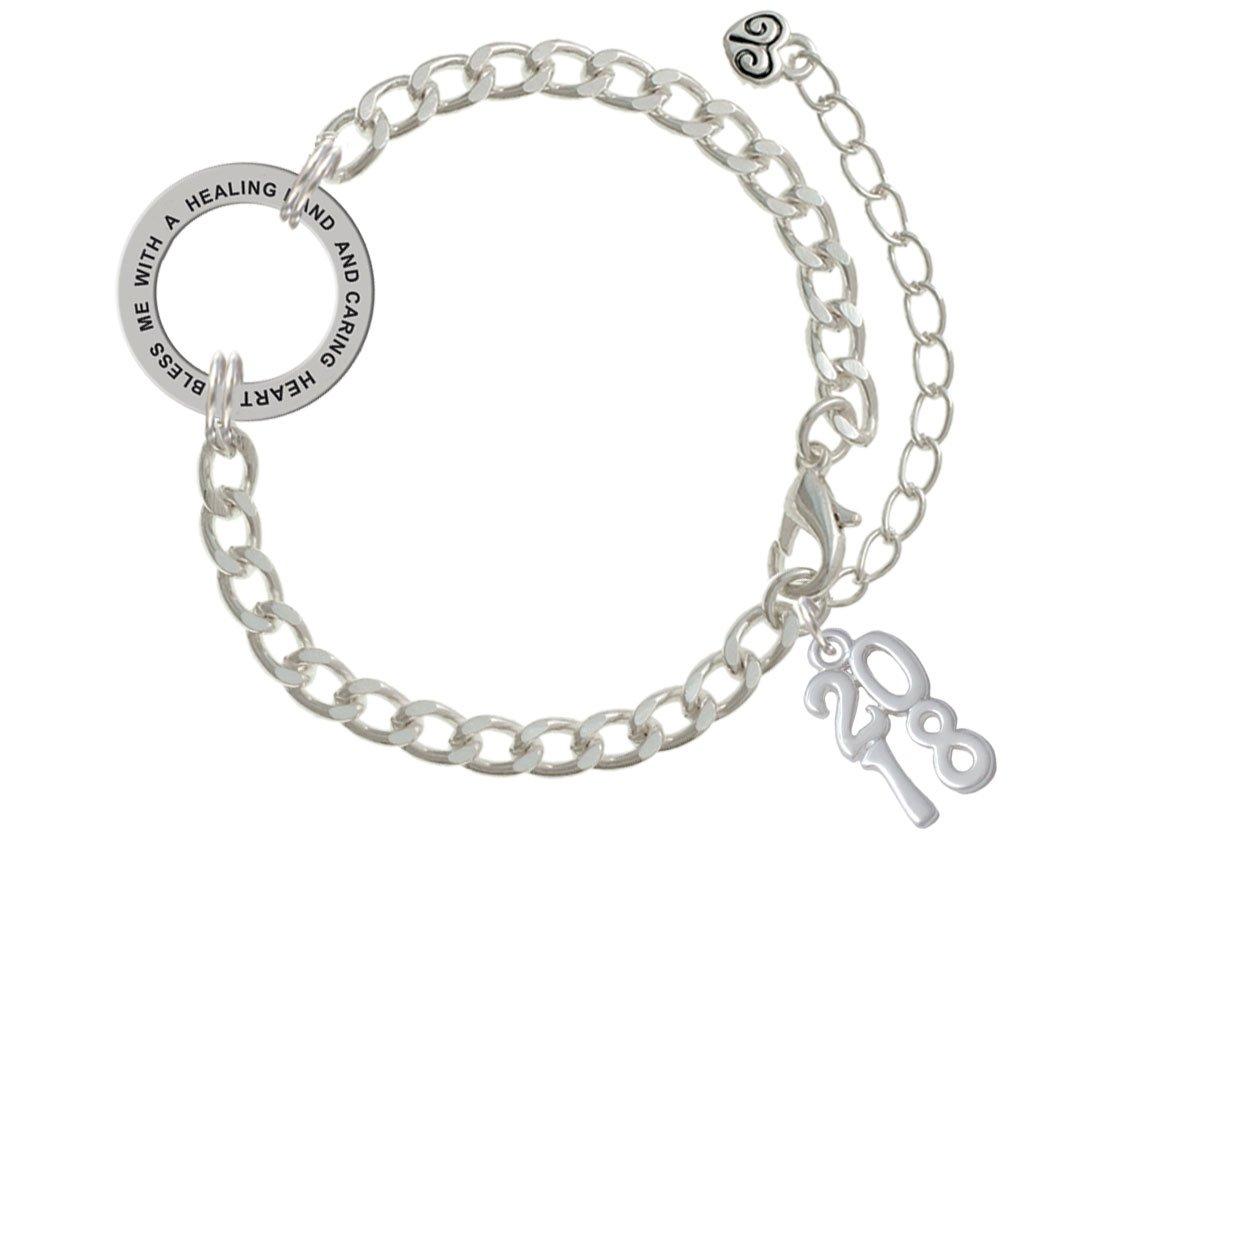 a68dc8ccfae9 Amazon.com  Vertical Year - 2018 - Healing Hand Affirmation Link Bracelet   Jewelry